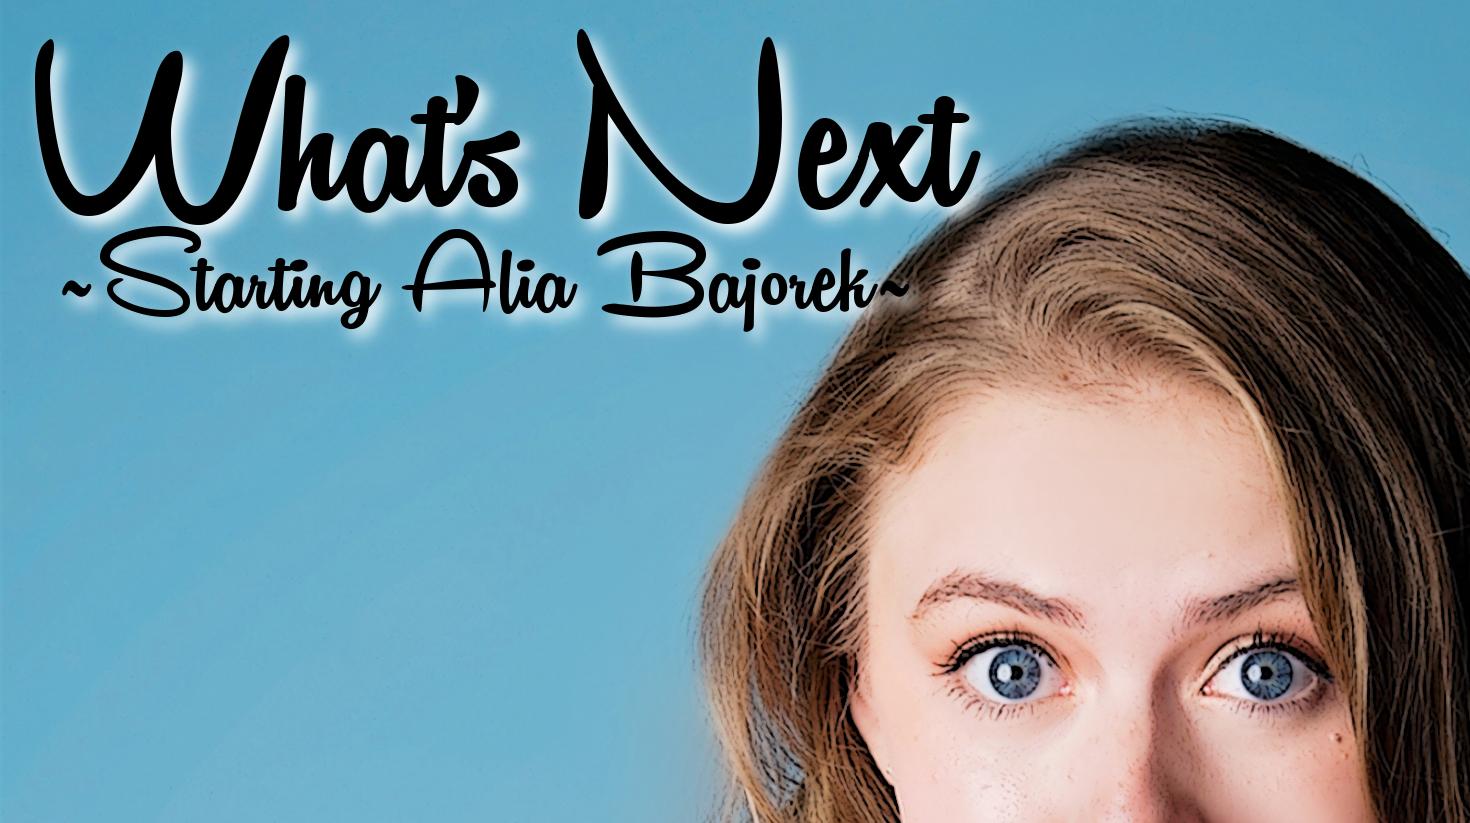 What's Next? Starting Alia Bajorek